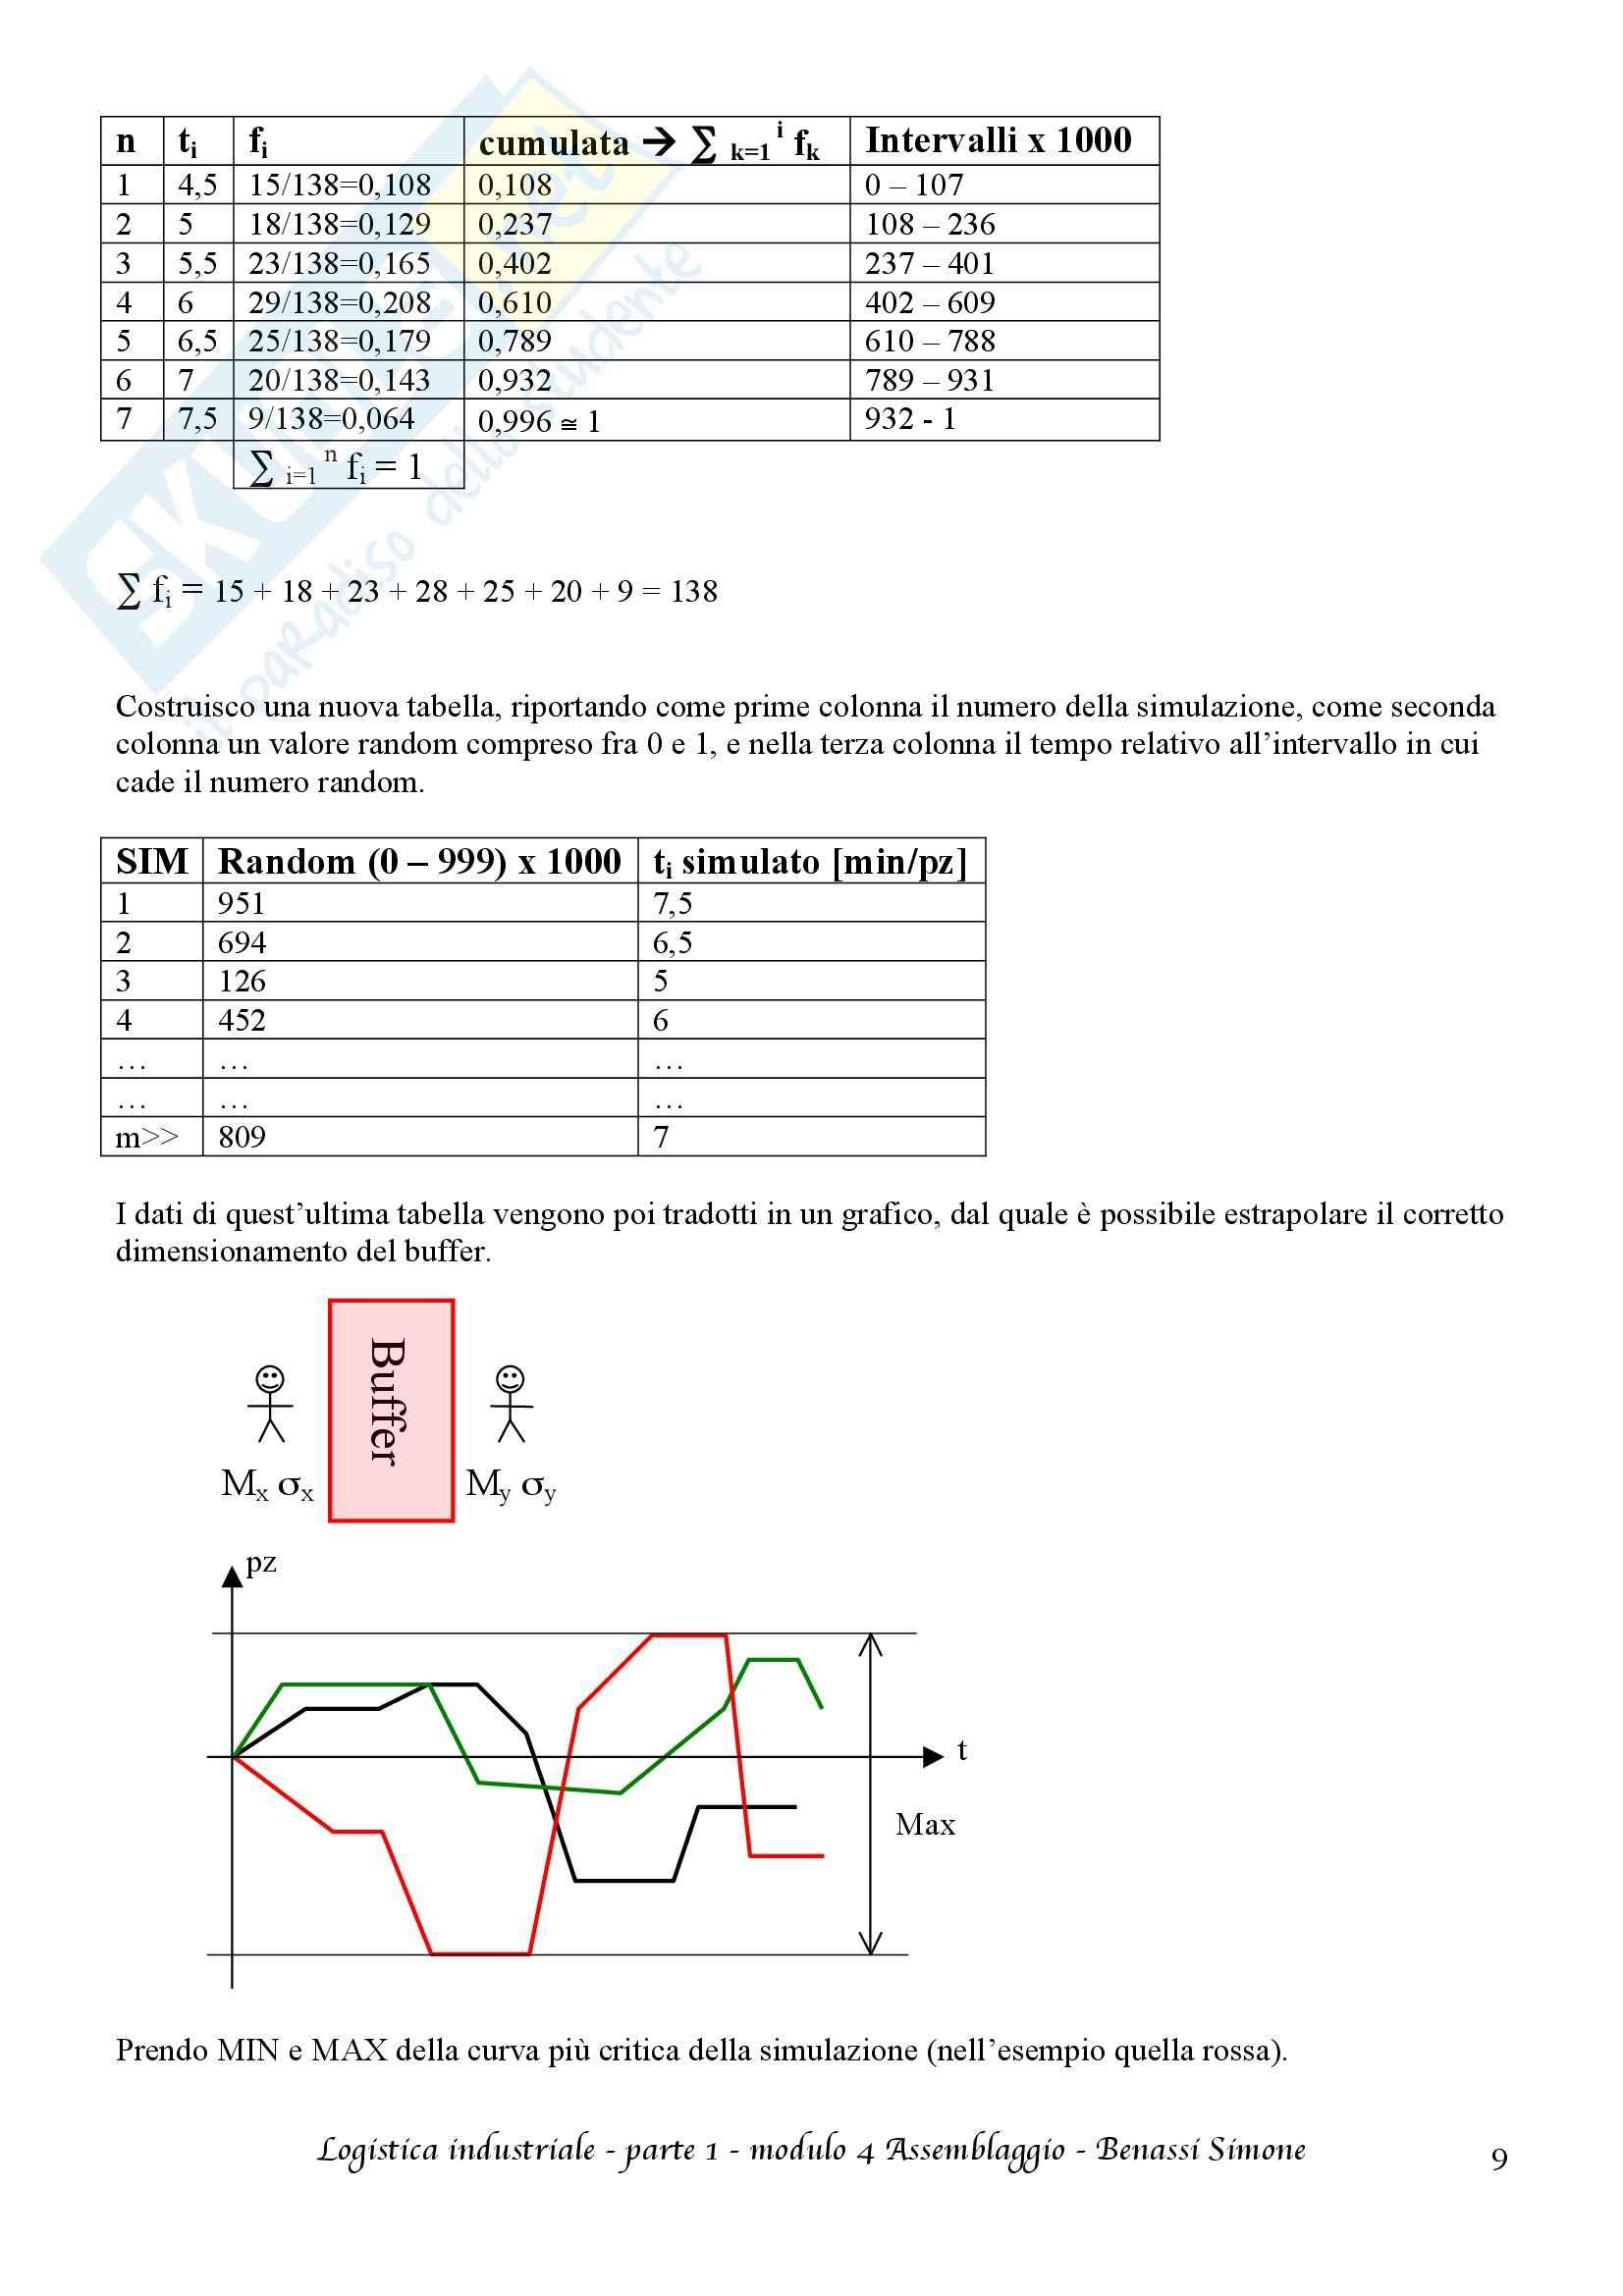 Logistica industriale T-AB - Appunti prima parte Pag. 26